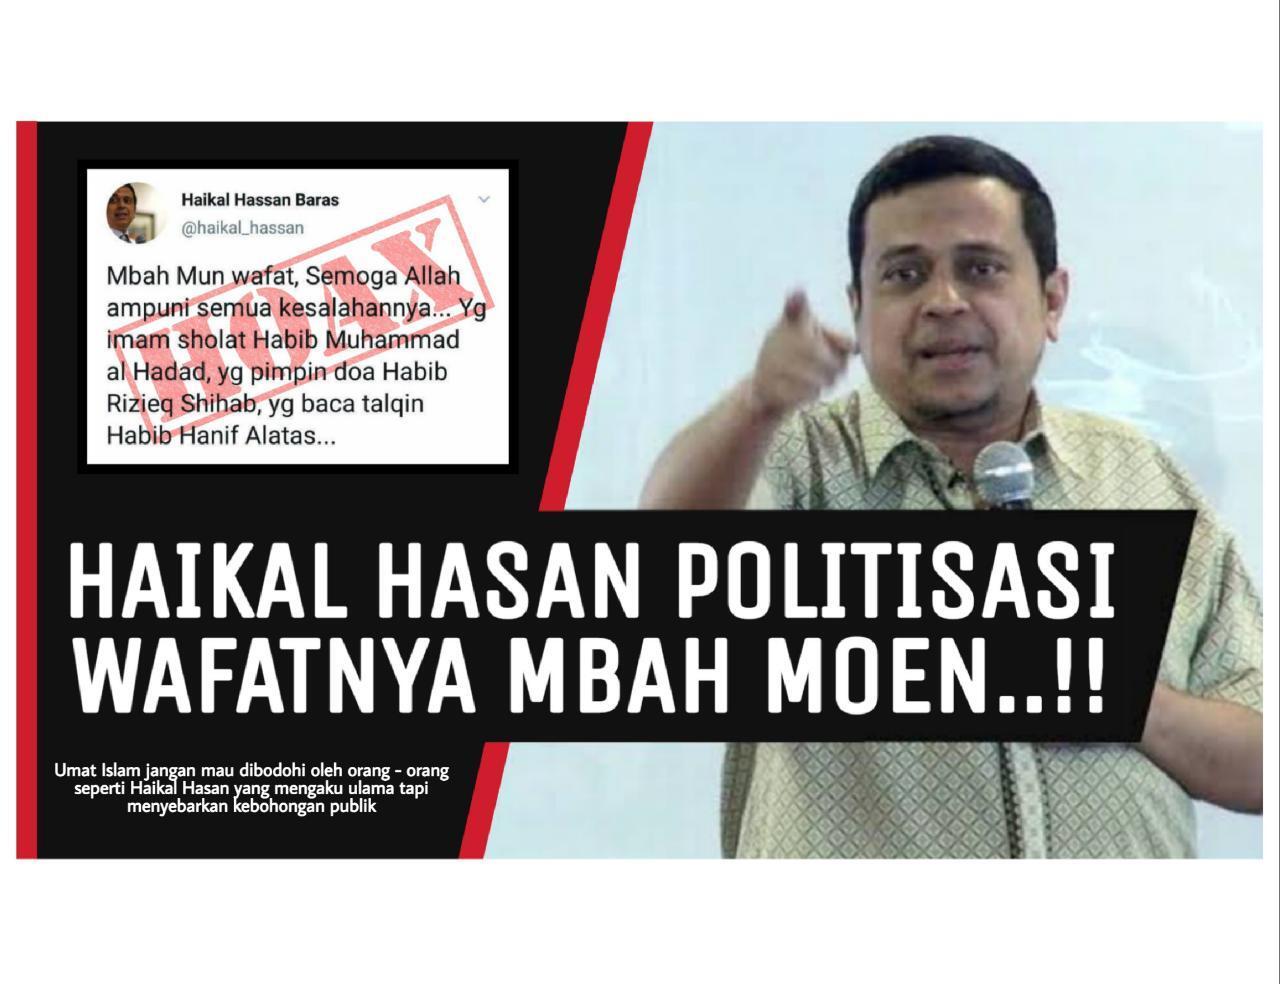 Politisasi KH. Maimoen Zubair, Haikal Hassan Sebarkan Informasi Hoaks di Media Sosial